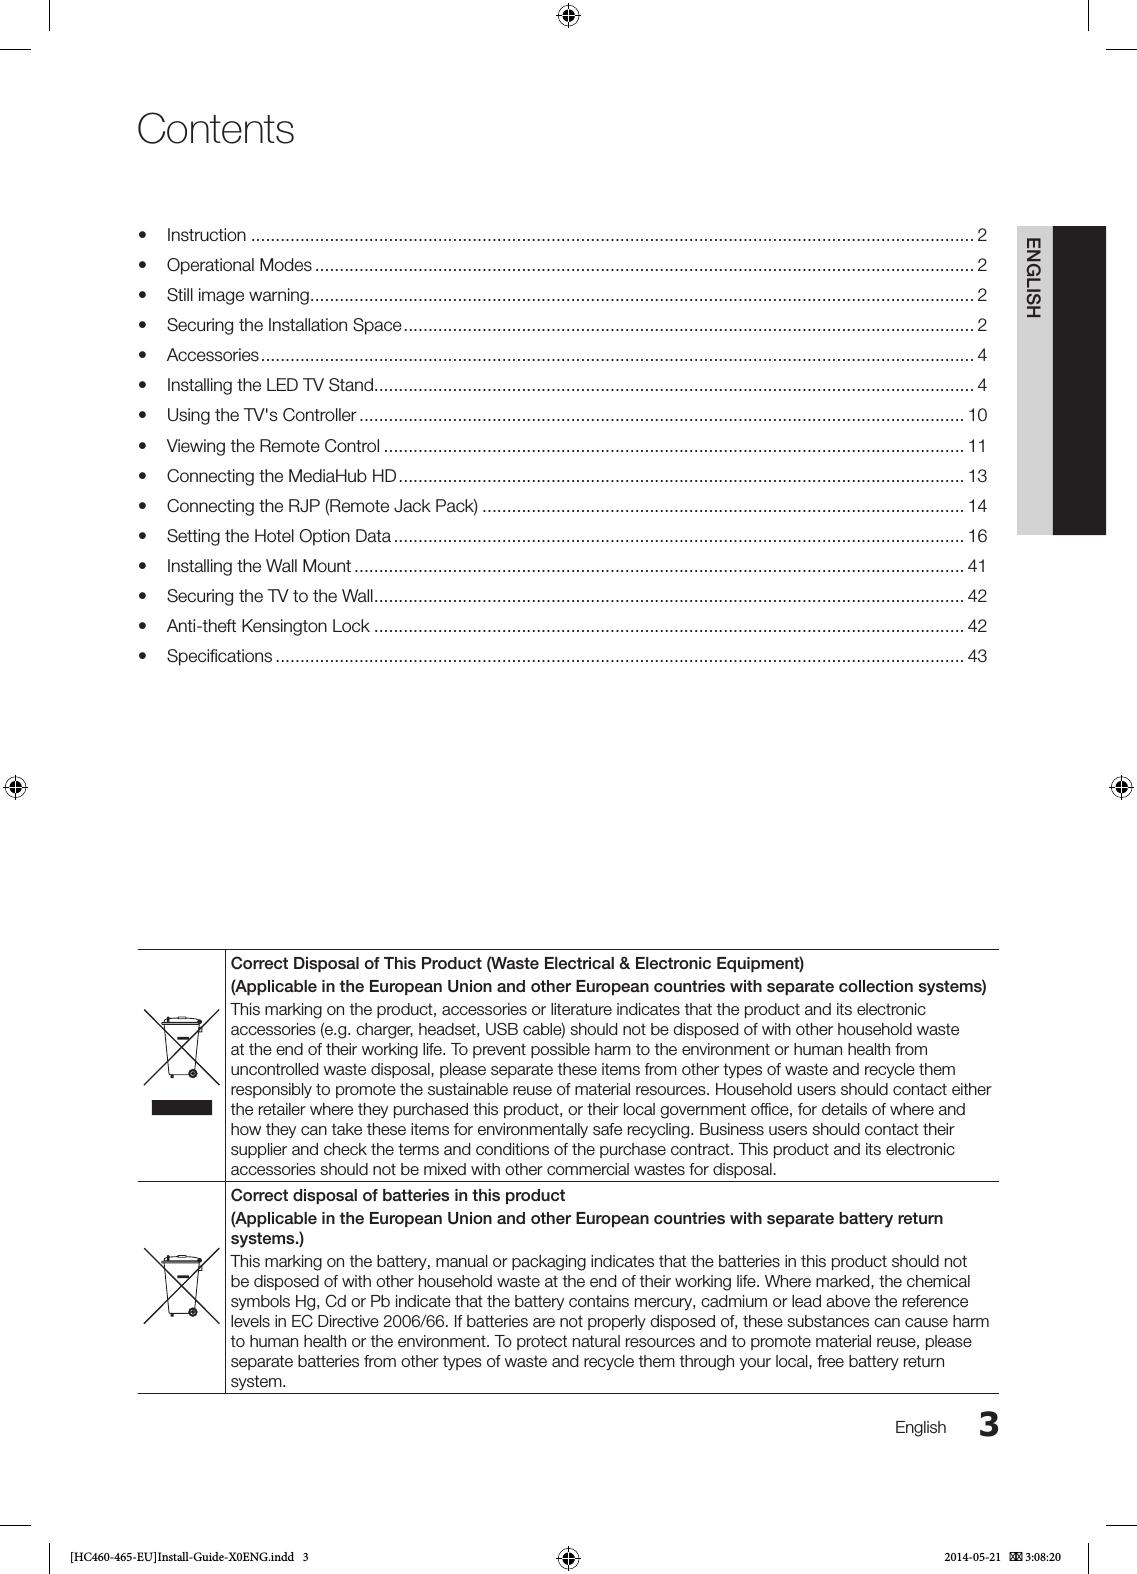 samsung j7 manual book pdf